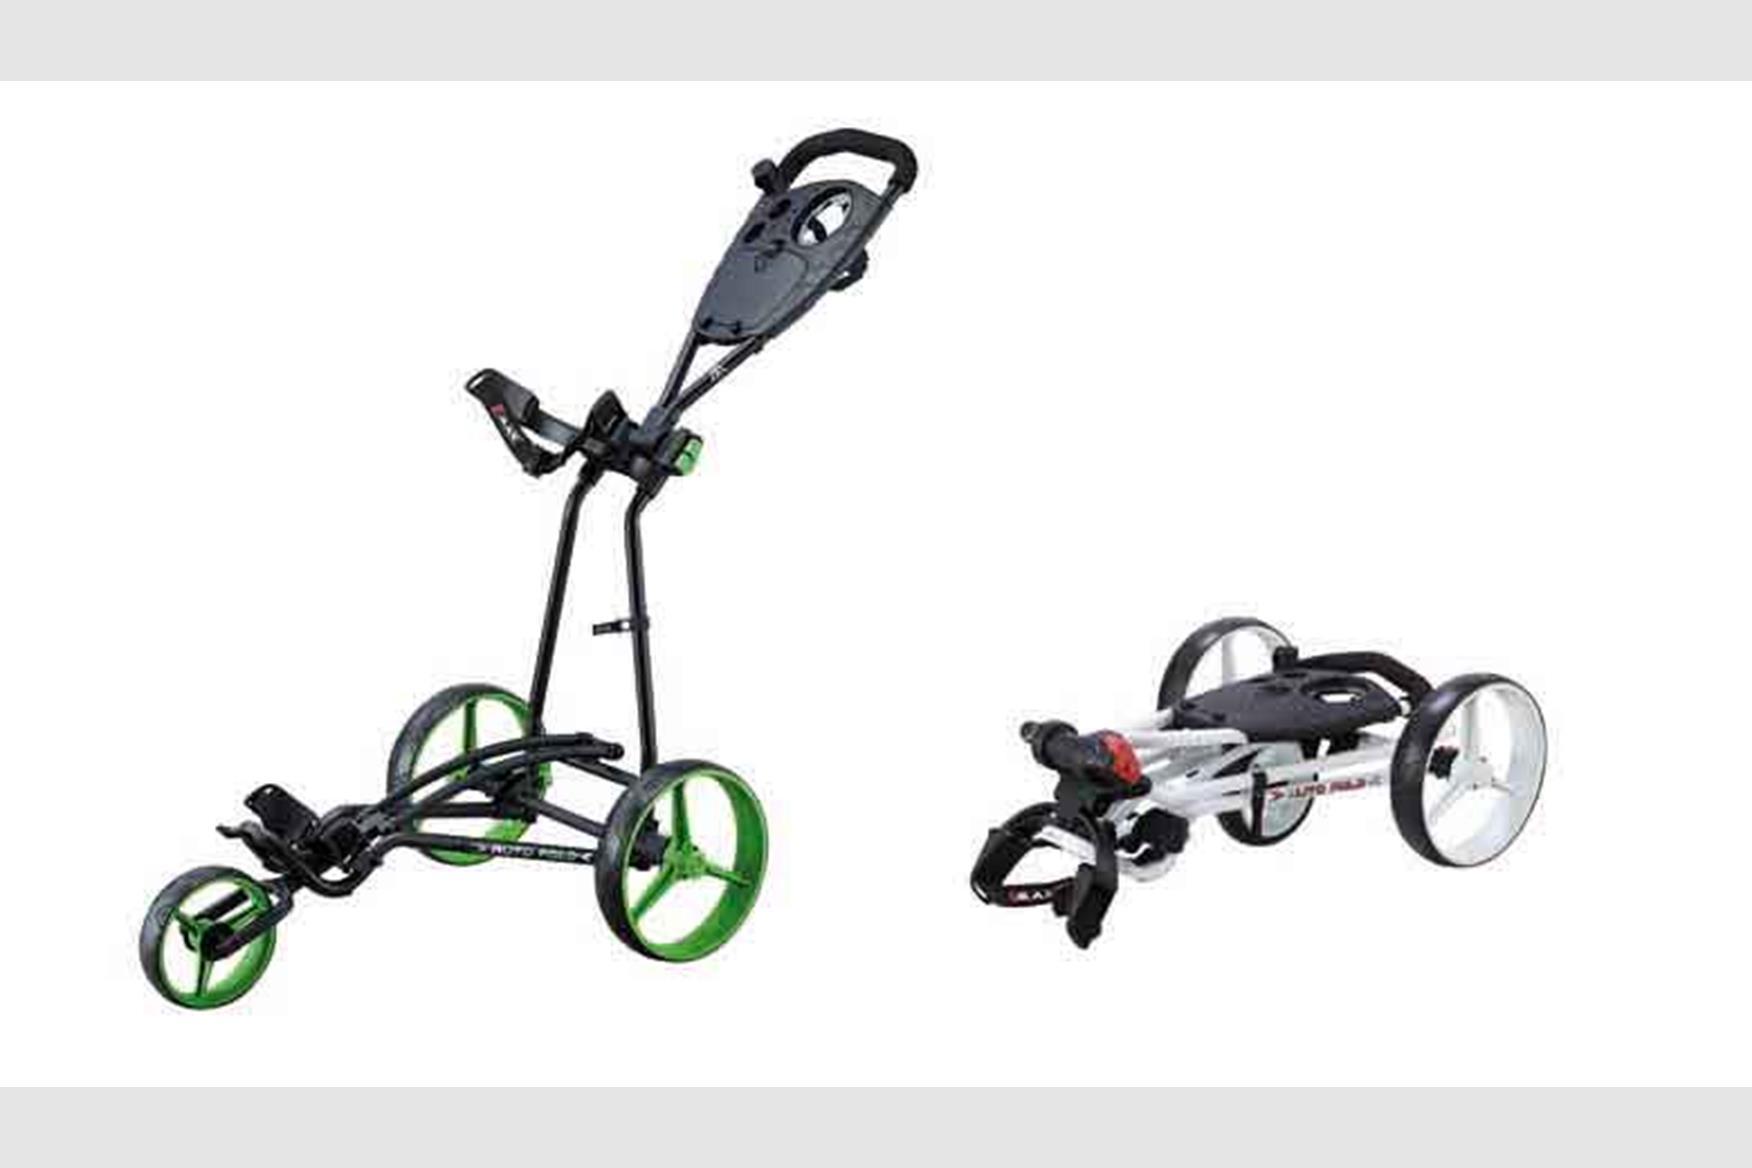 Big Max Autofold Golftrolley.Big Max Ti 1000 Autofold Golf Trolley Review Equipment